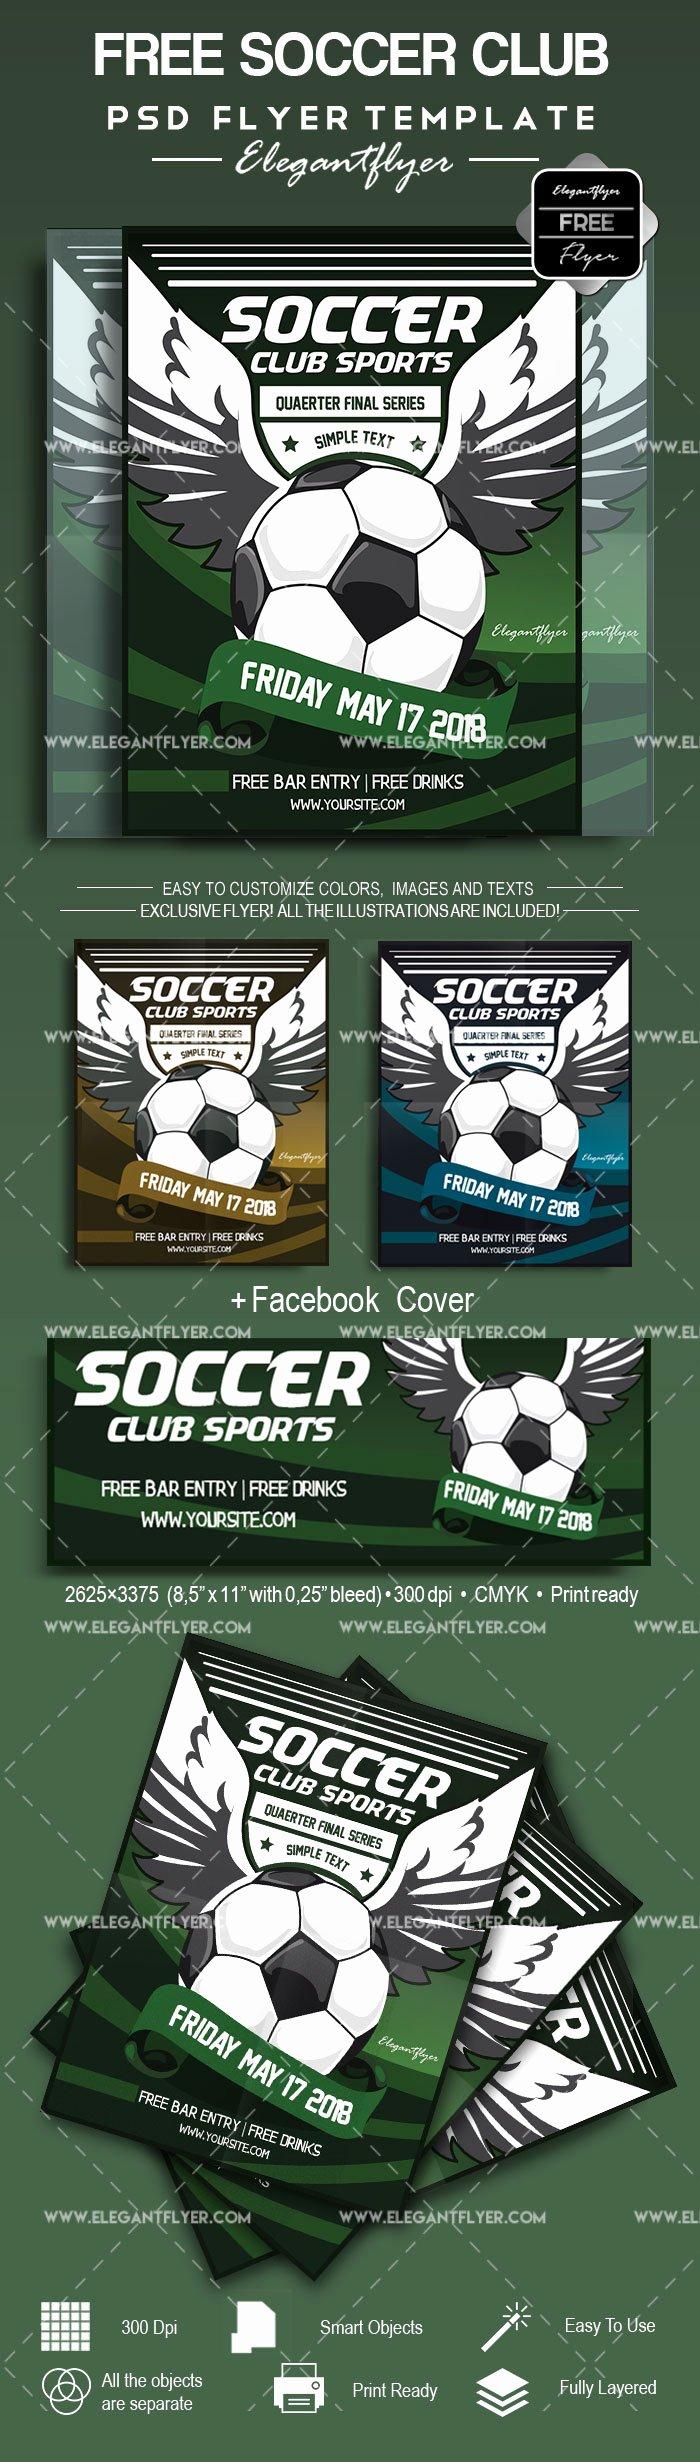 Soccer Flyer Template Free Inspirational soccer – Free Flyer Psd Template – by Elegantflyer